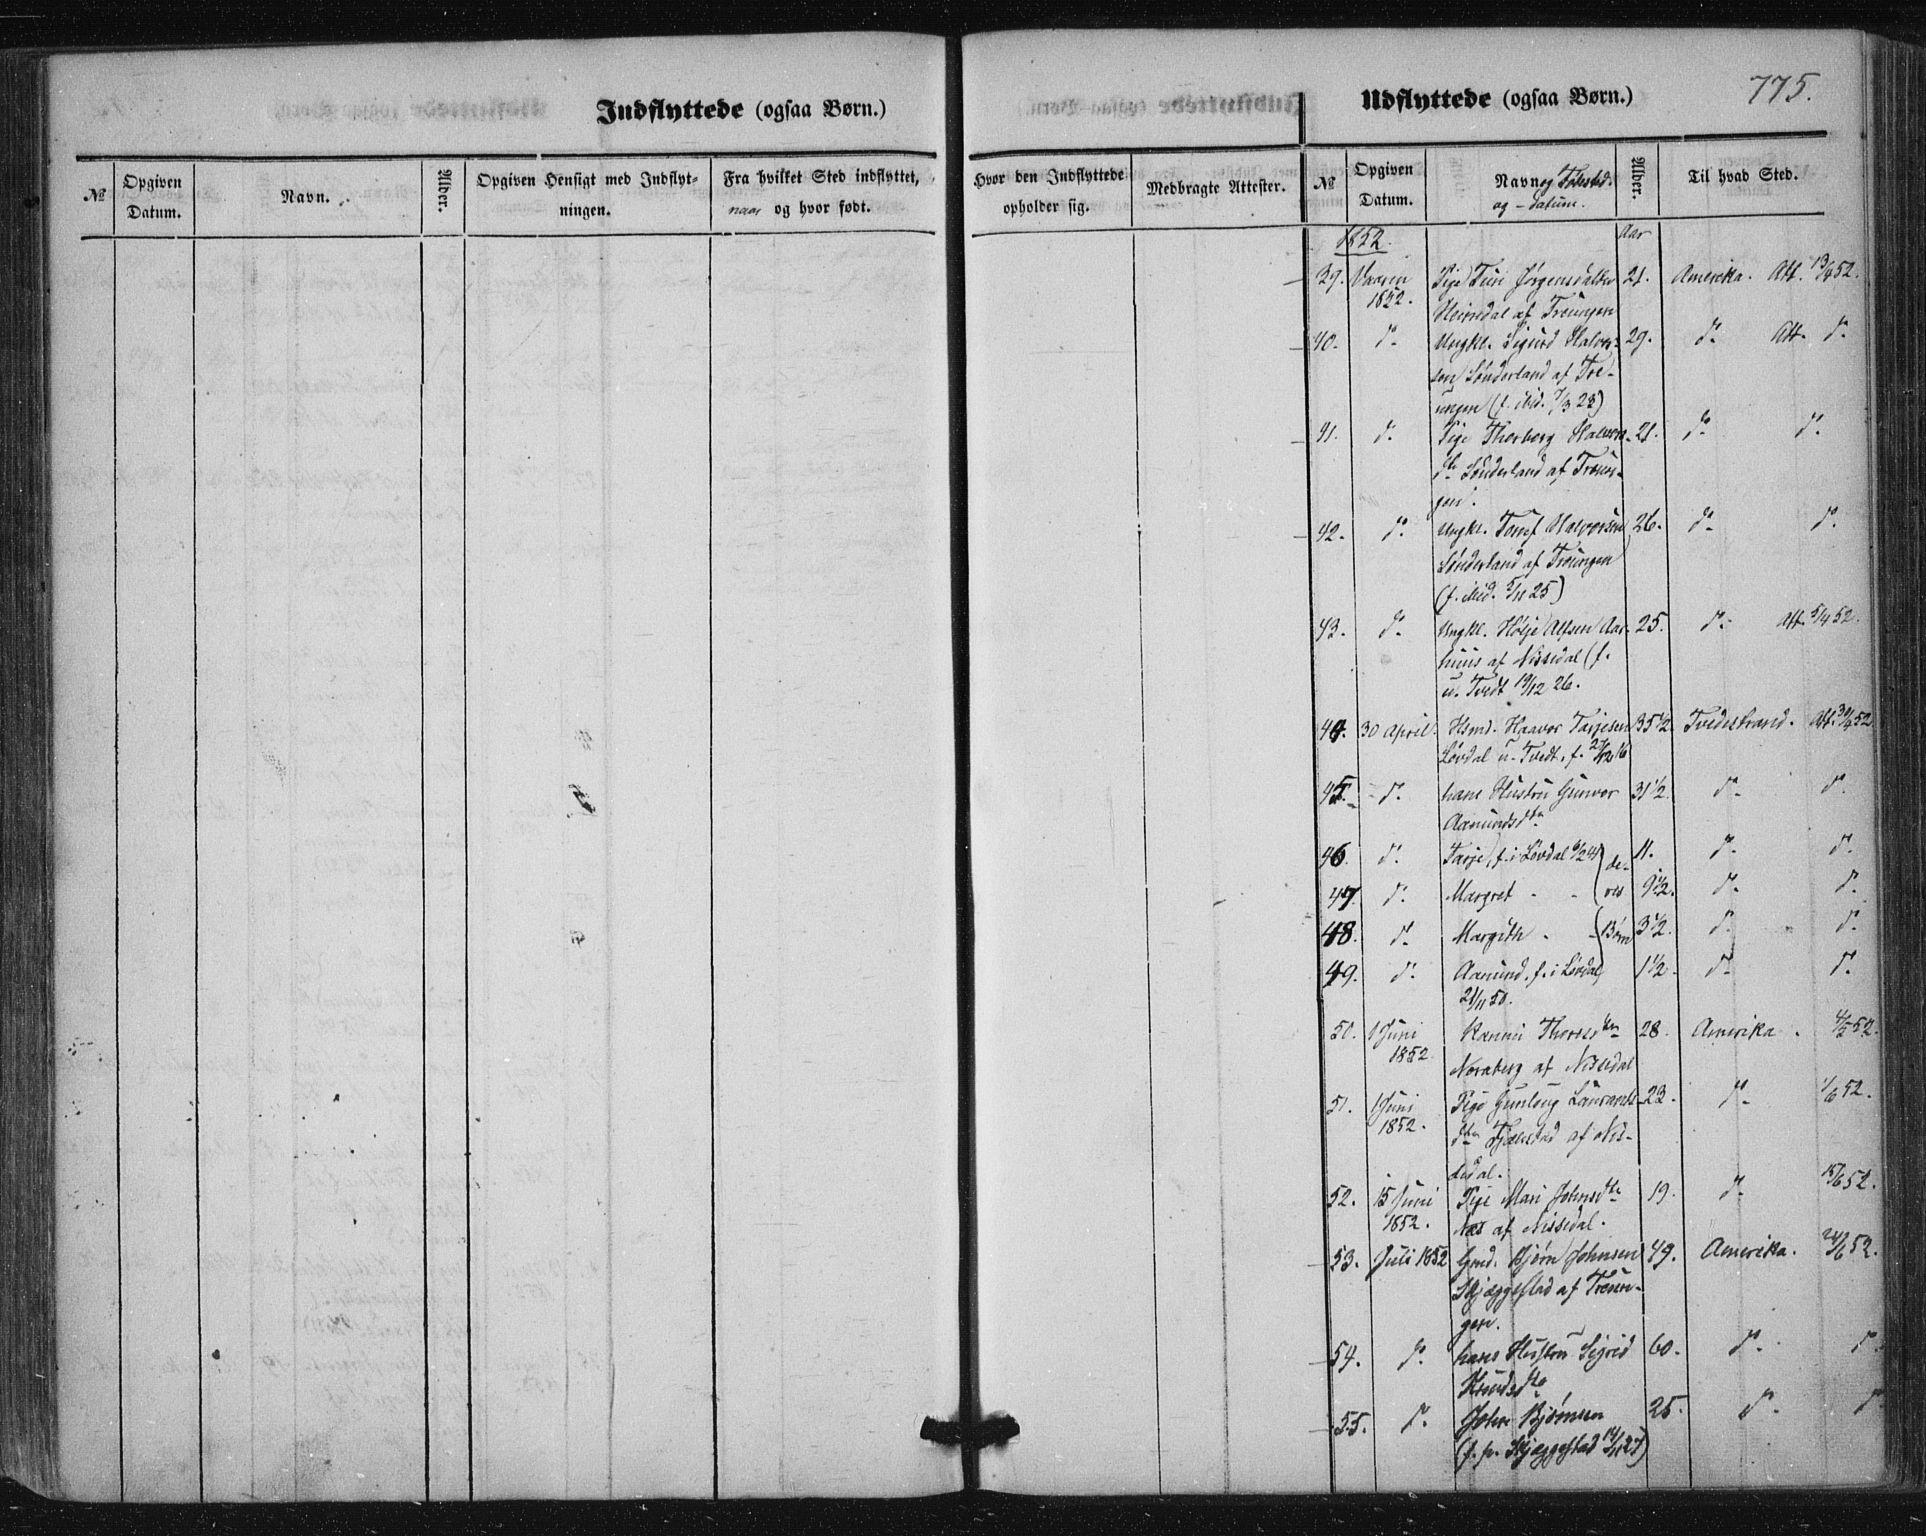 SAKO, Nissedal kirkebøker, F/Fa/L0003: Ministerialbok nr. I 3, 1846-1870, s. 774-775